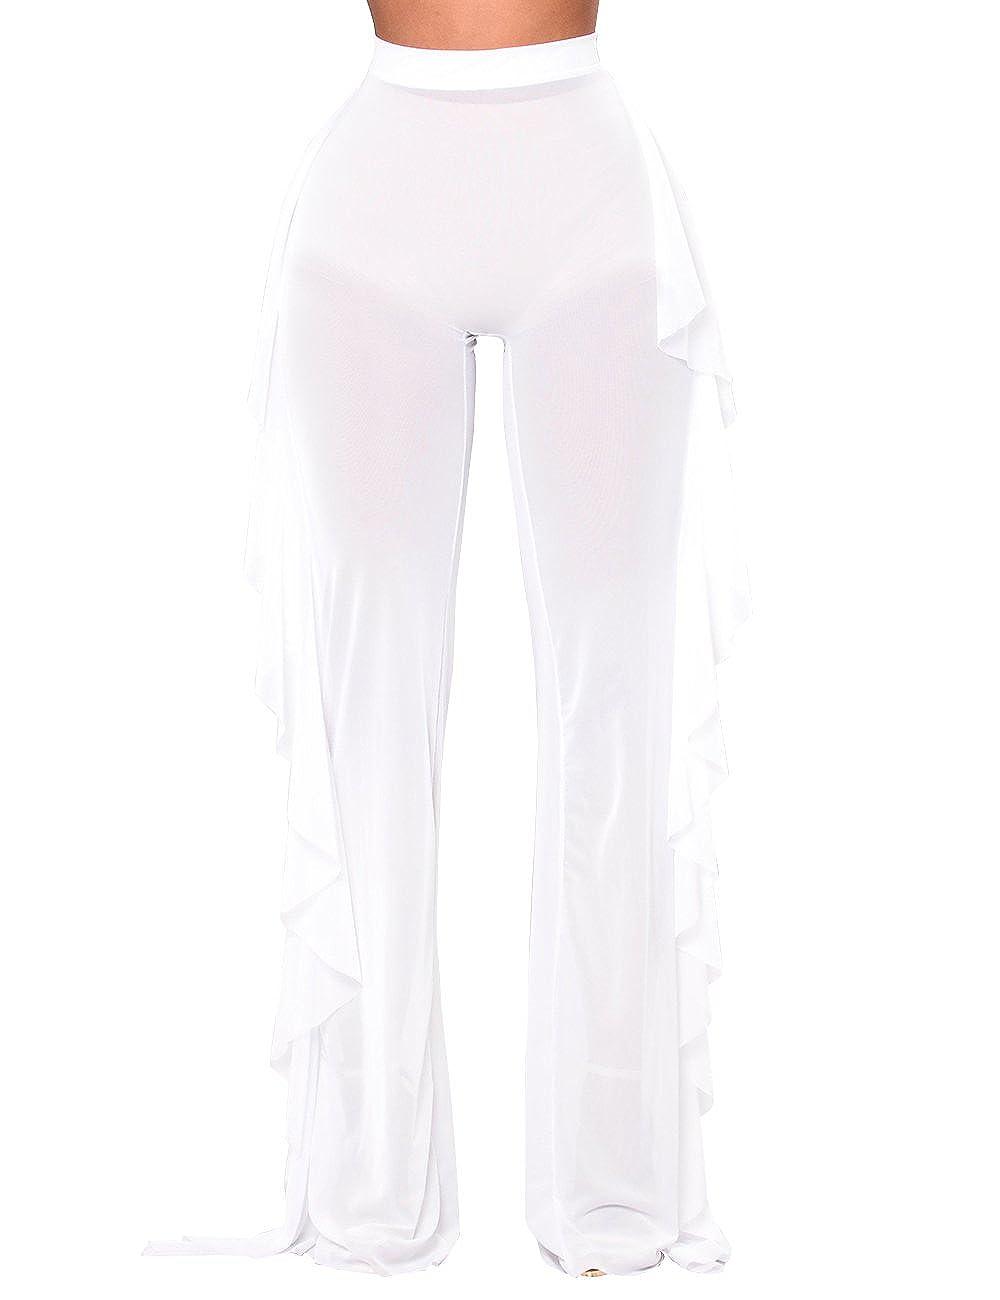 42a56bf5490 HAHASOLE Women Sheer Pants Cover Up Ruffle Swimwear See Through Mesh Swim  Sexy Long Pant Bikini Beach at Amazon Women's Clothing store: